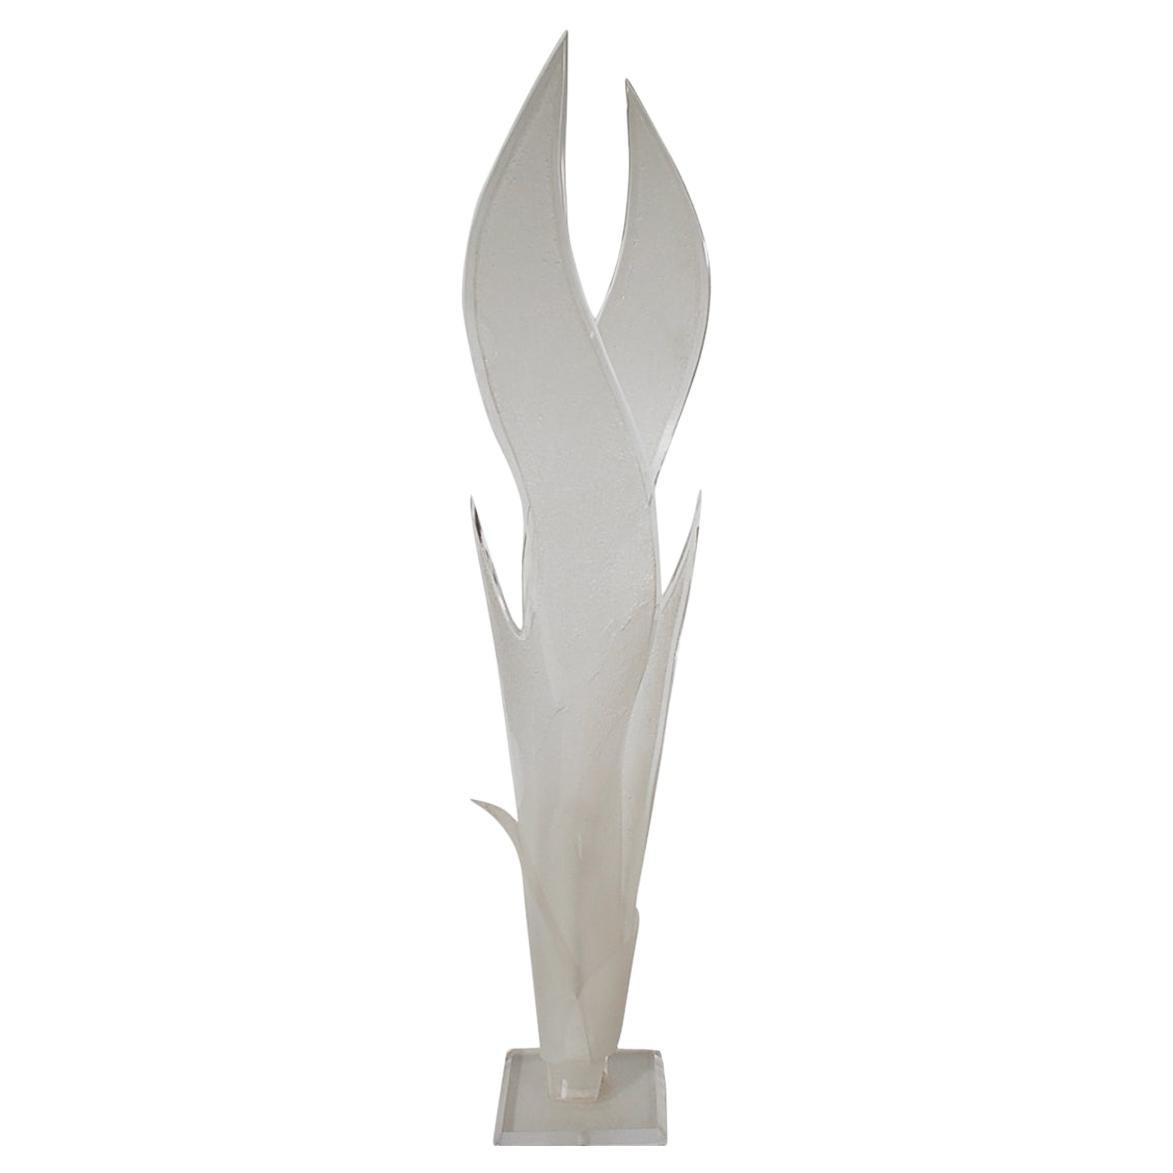 Tall Midcentury Italian Postmodern Acrylic Lucite Sculptural Floor Lamp